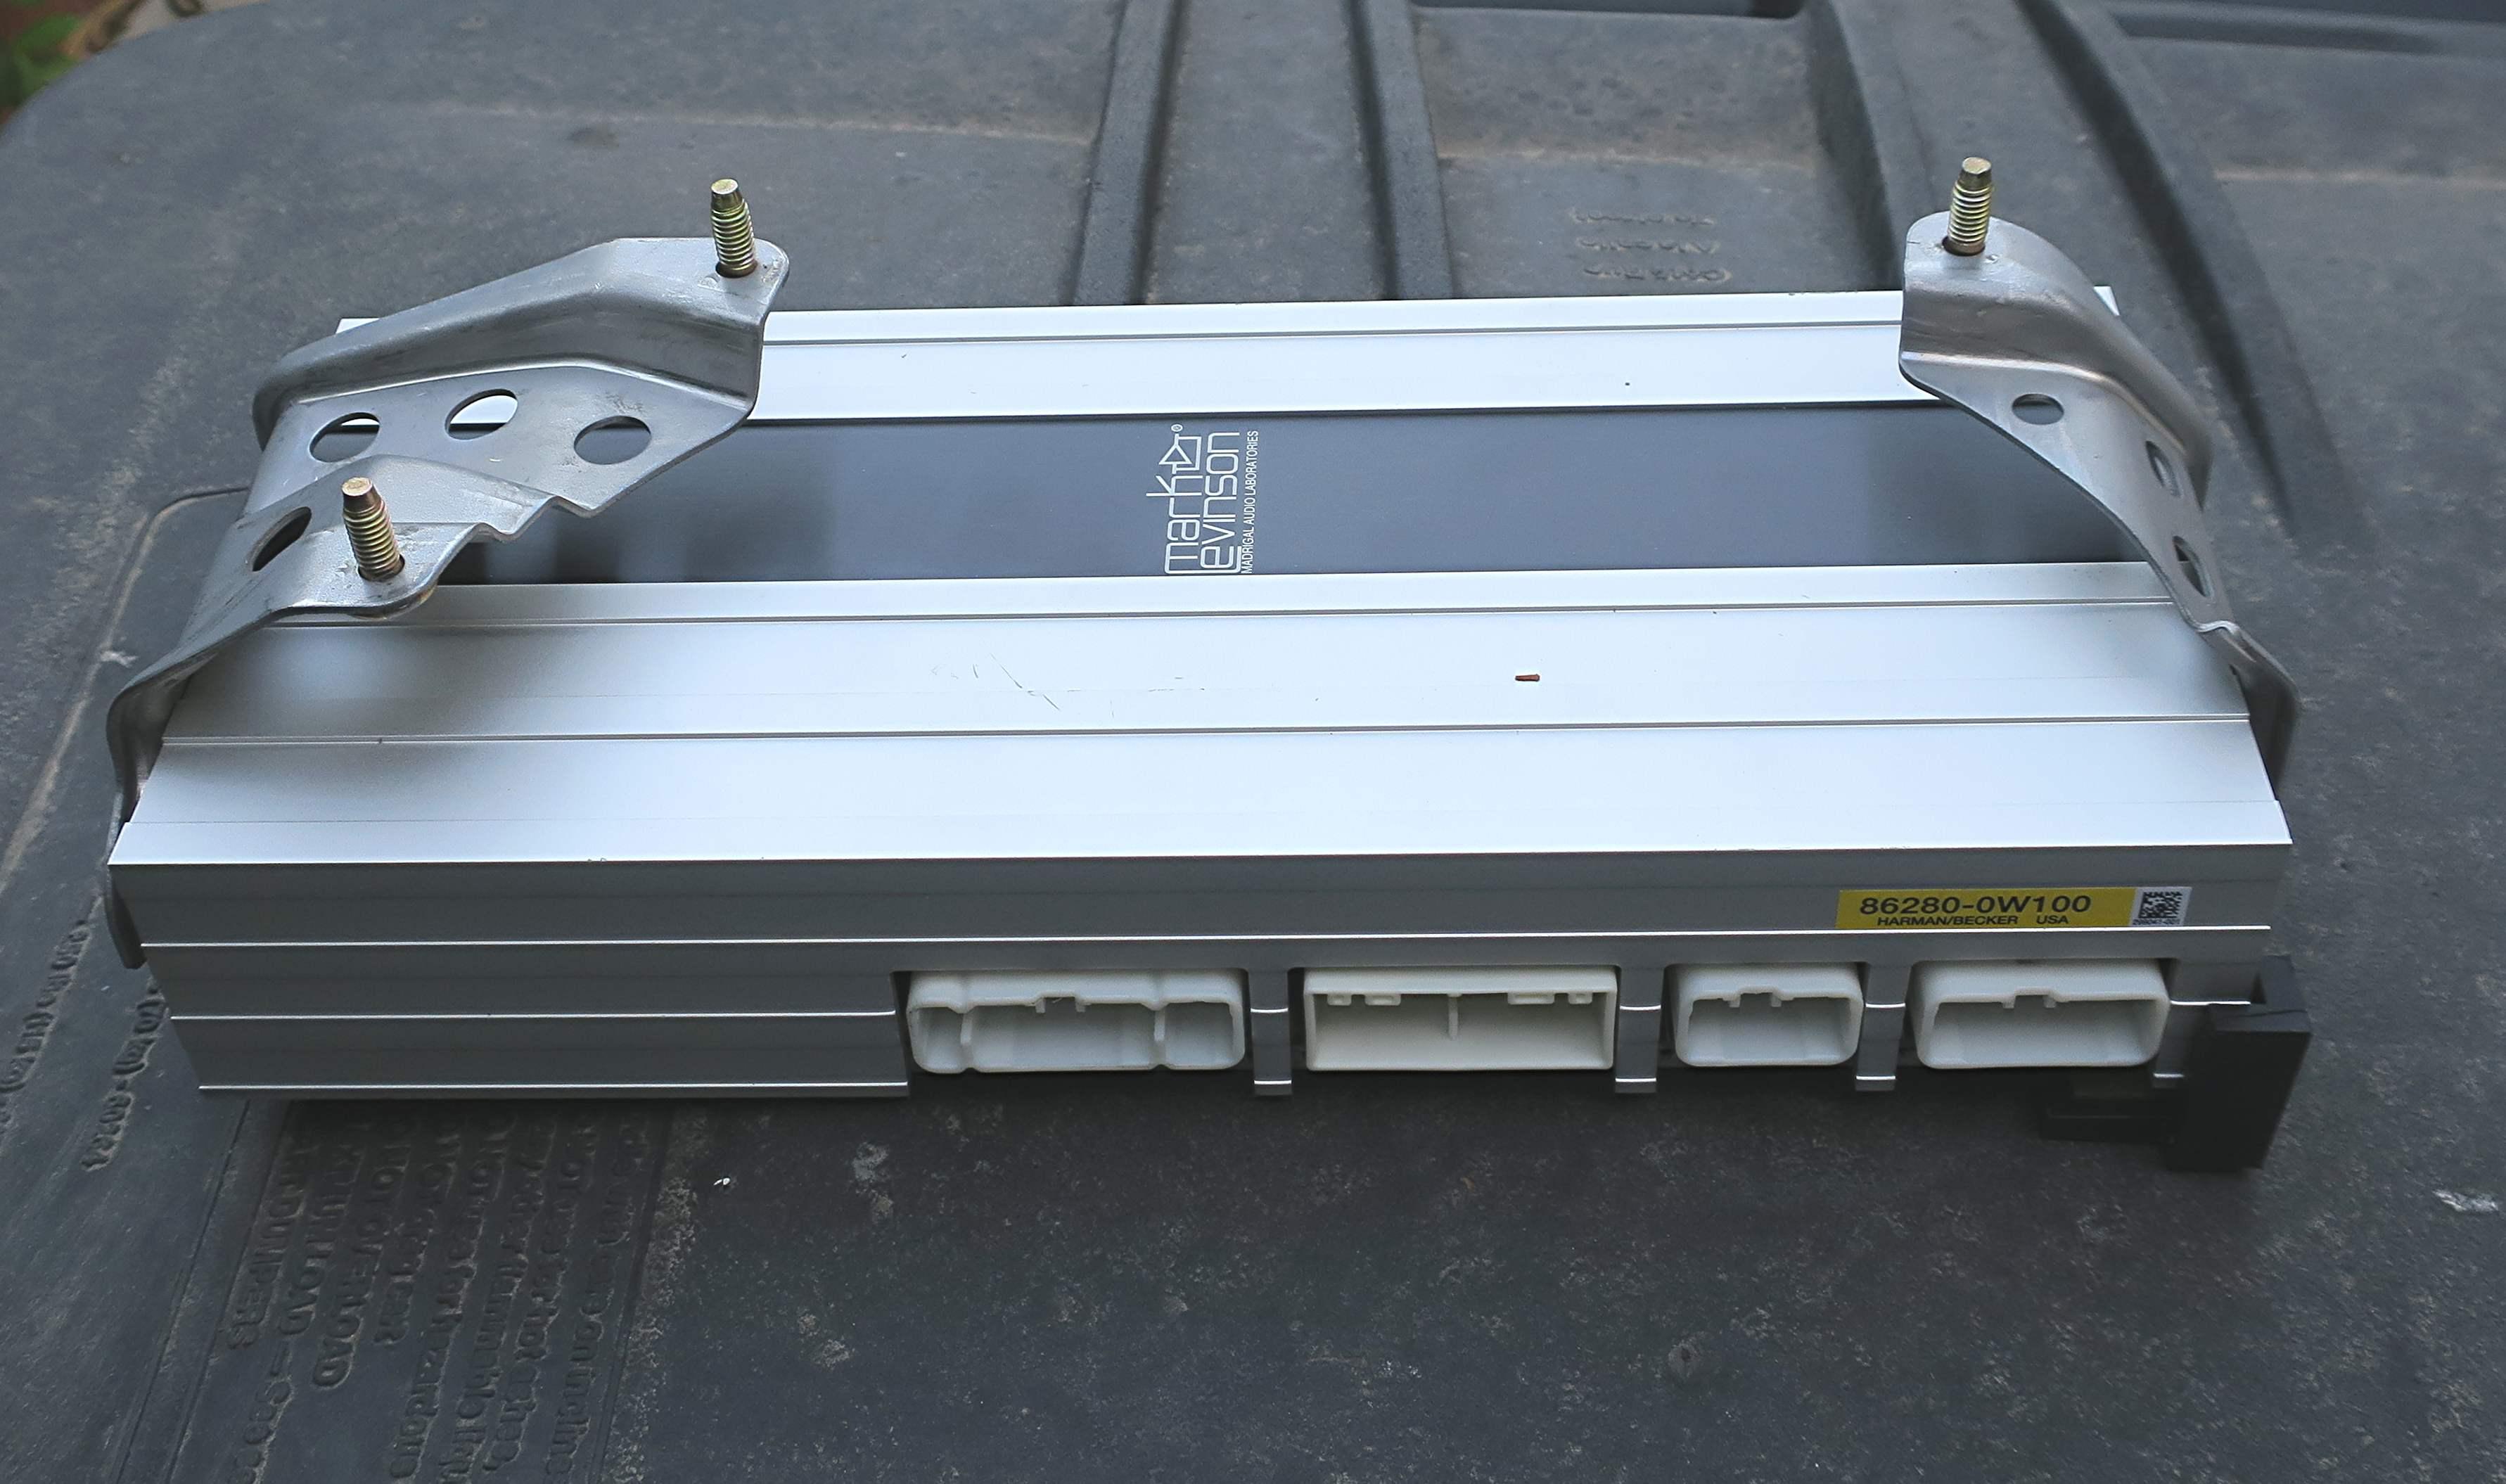 04 Es-330 No Radio/cd Audio, Nav Audio Ok - 92 - 06 Lexus ES250/300